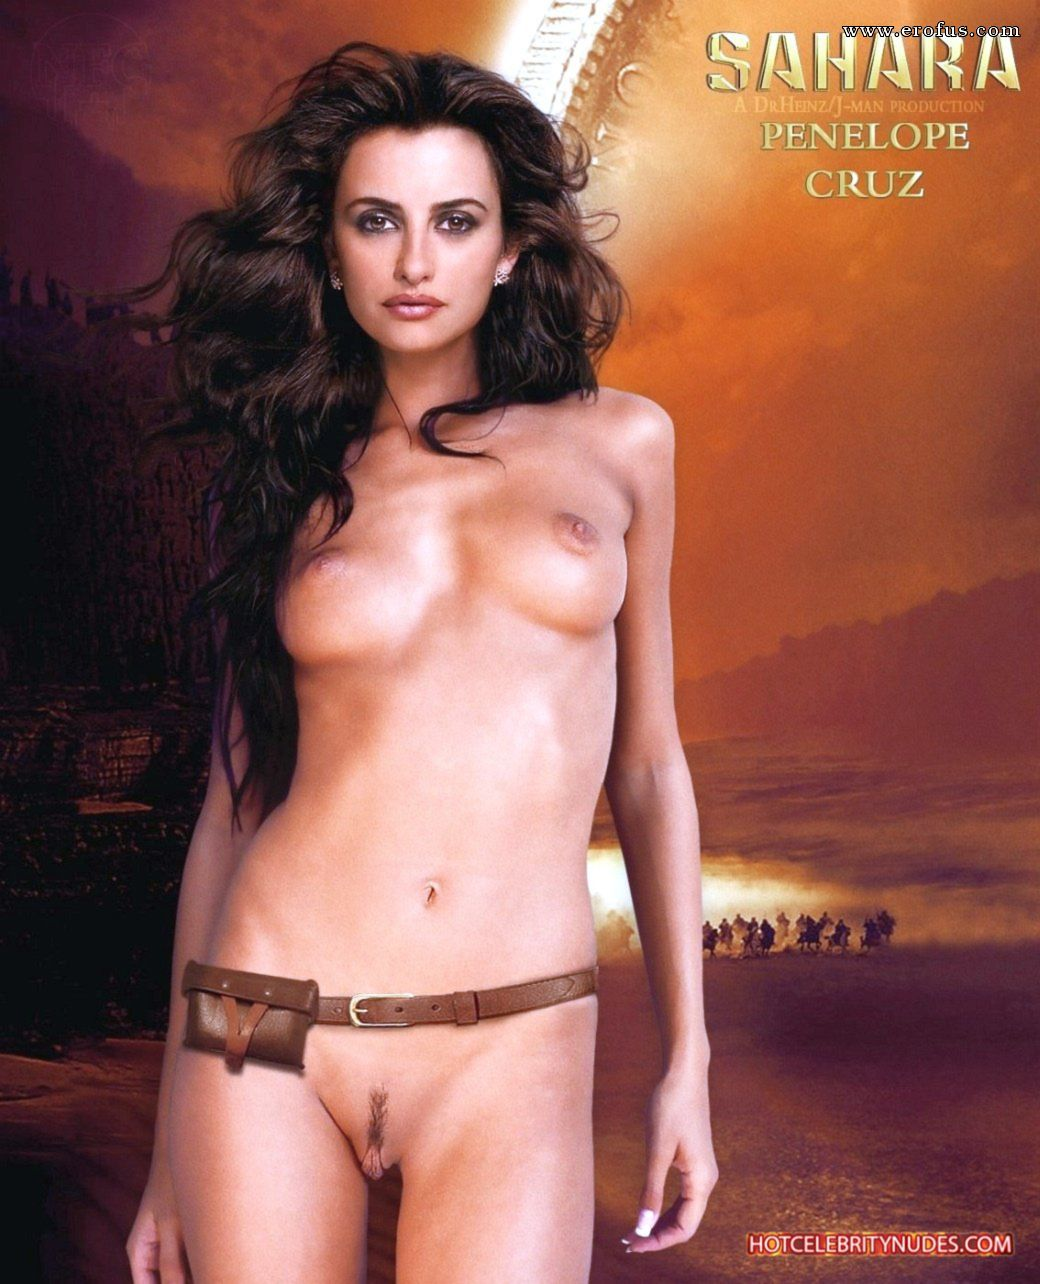 Good idea nude penelope fakes cruz opinion